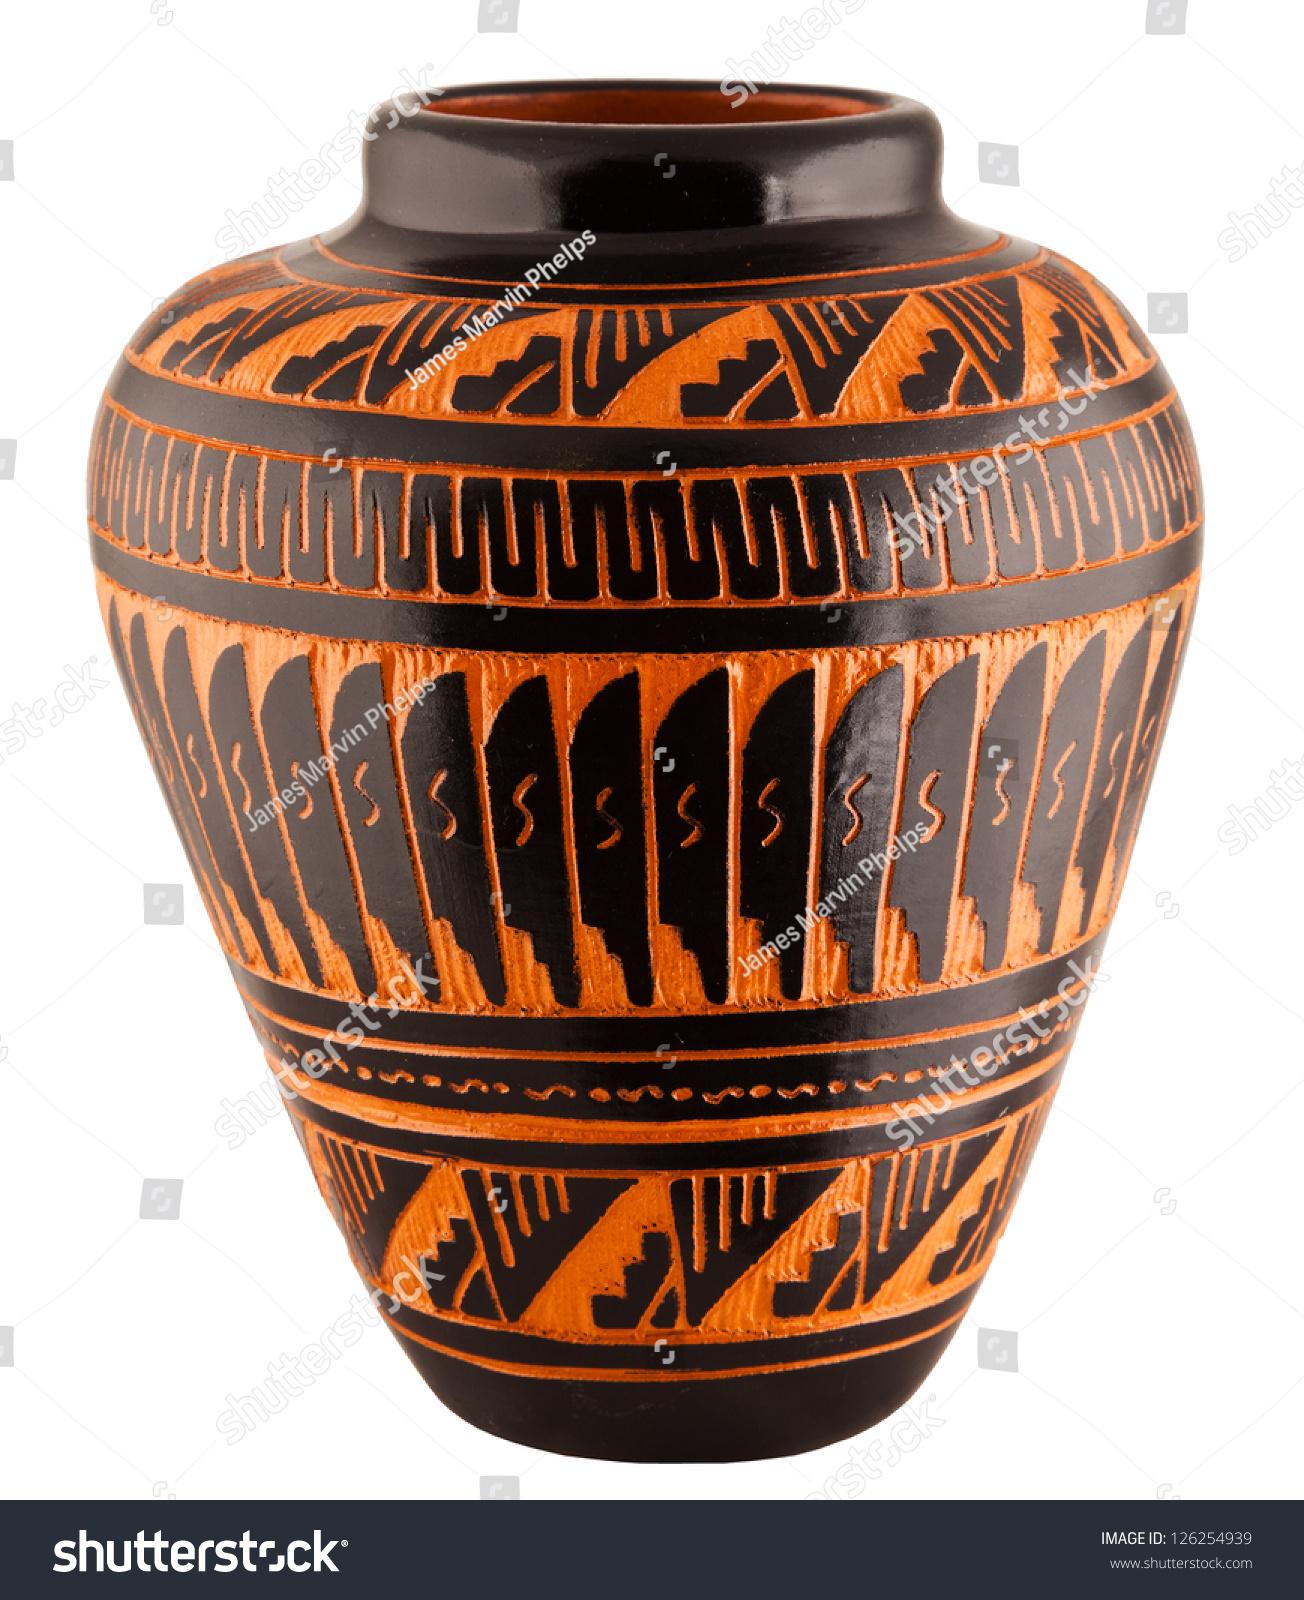 Navajo Native American Clay Pottery Decorative Vase Stock